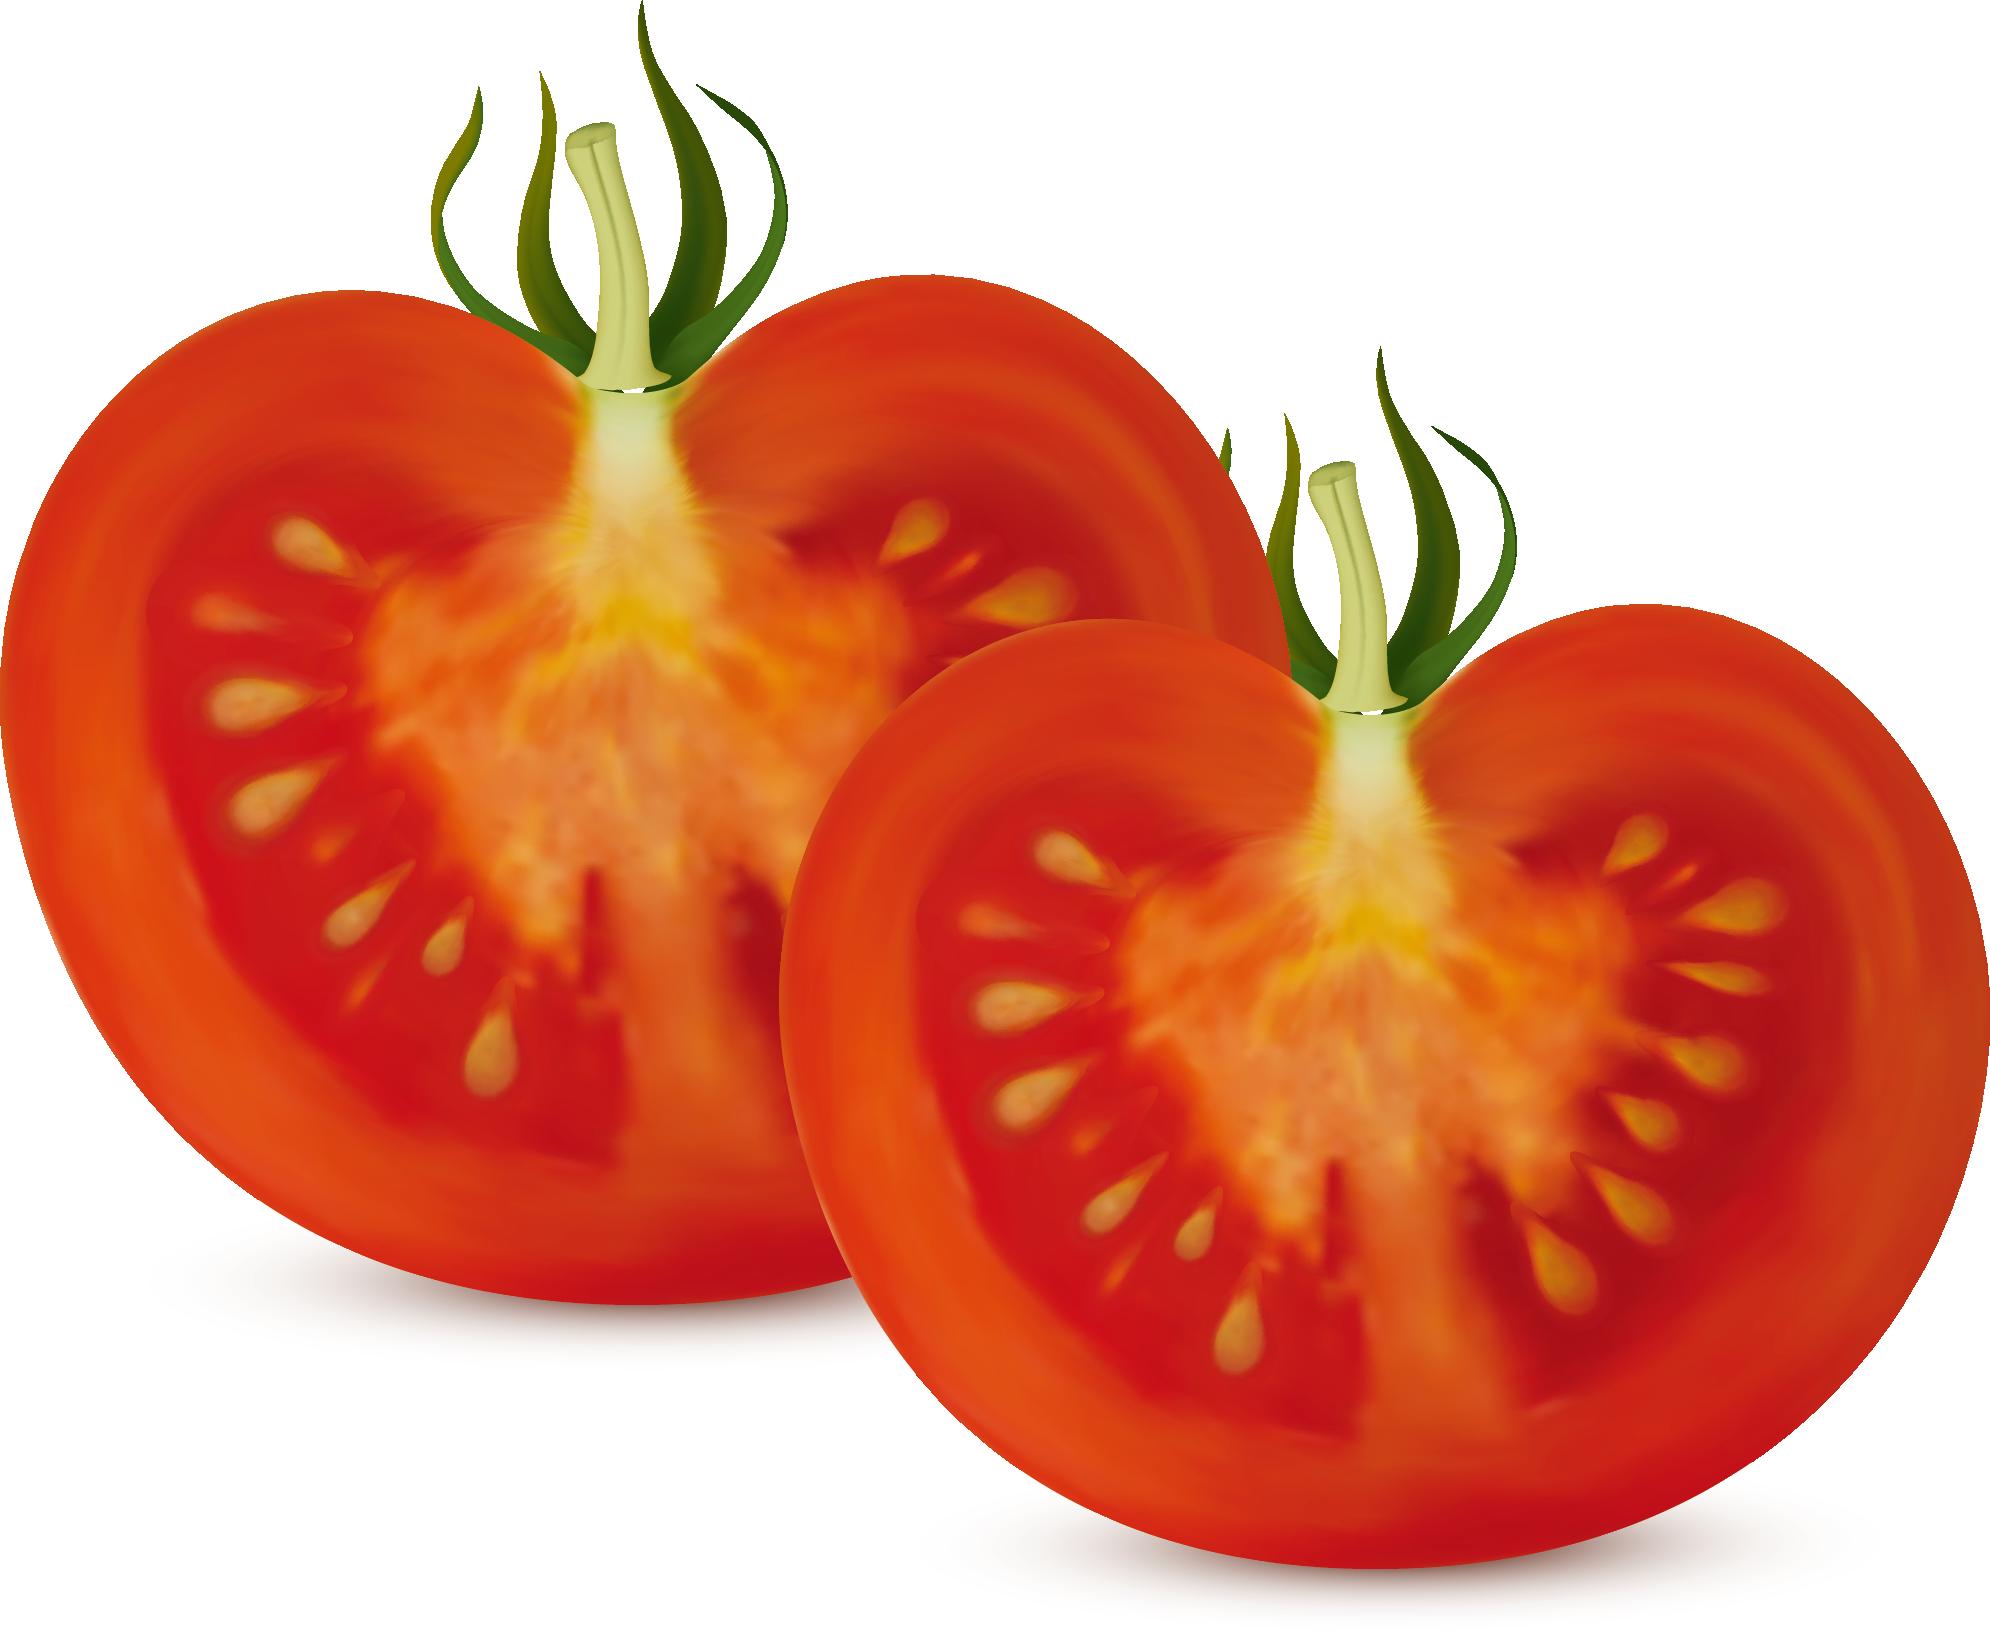 Sauce vegetable clip art. Tomatoes clipart tomato juice